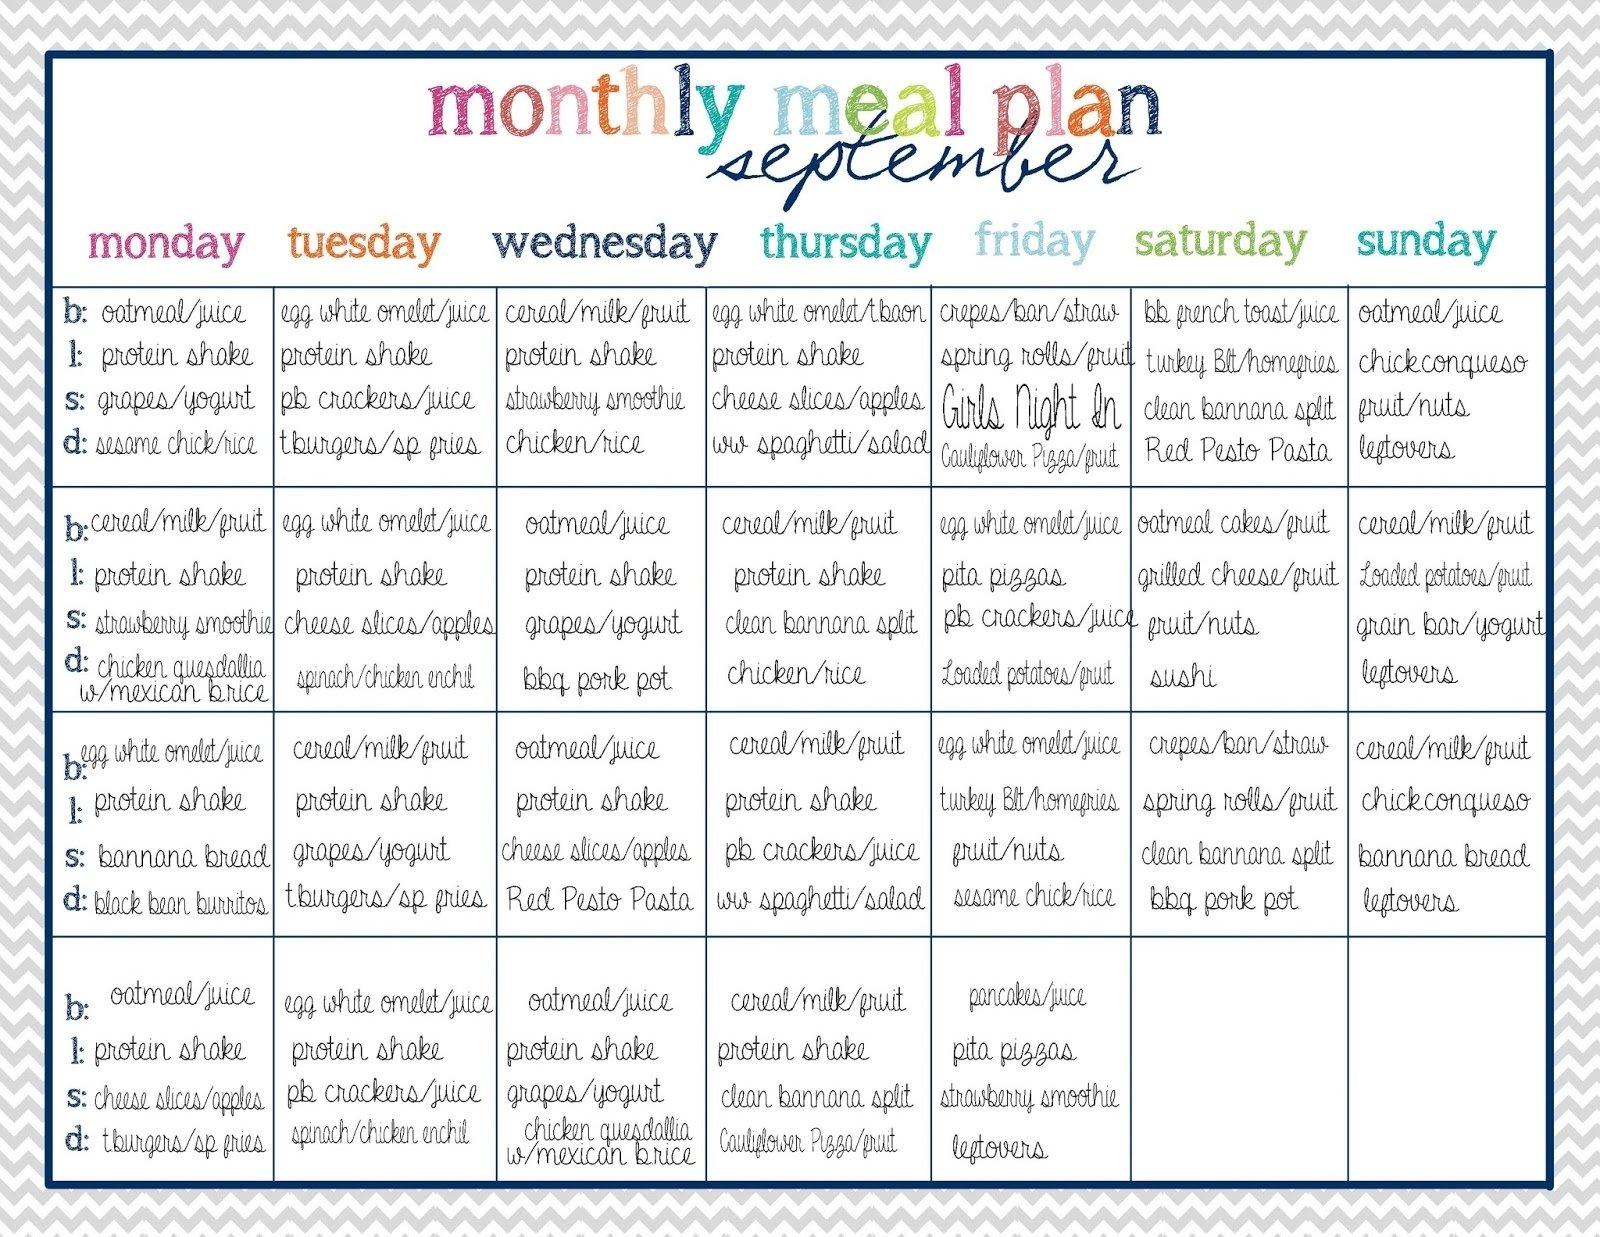 10 Fantastic Healthy Menu Ideas For The Week weekly healthy menu planner roberto mattni co 2020